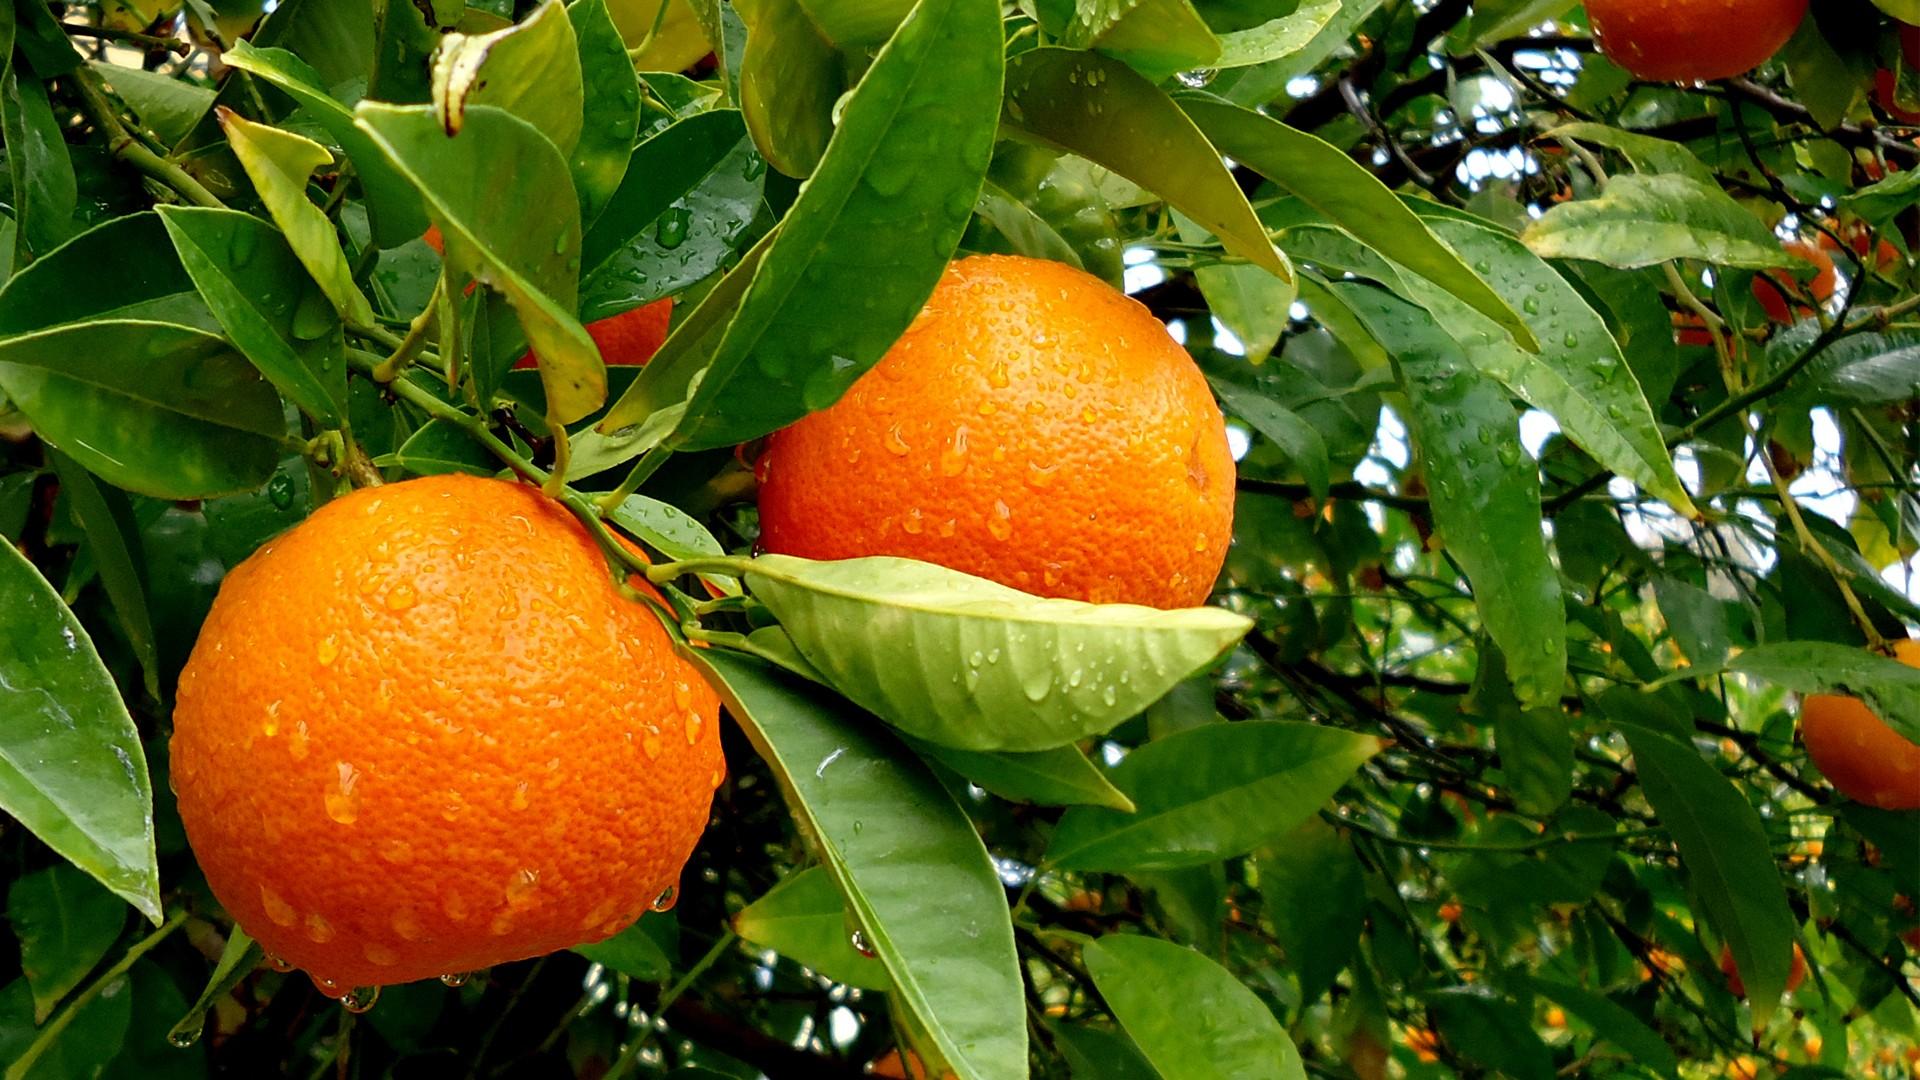 derevo-frukt-apelsin-listya